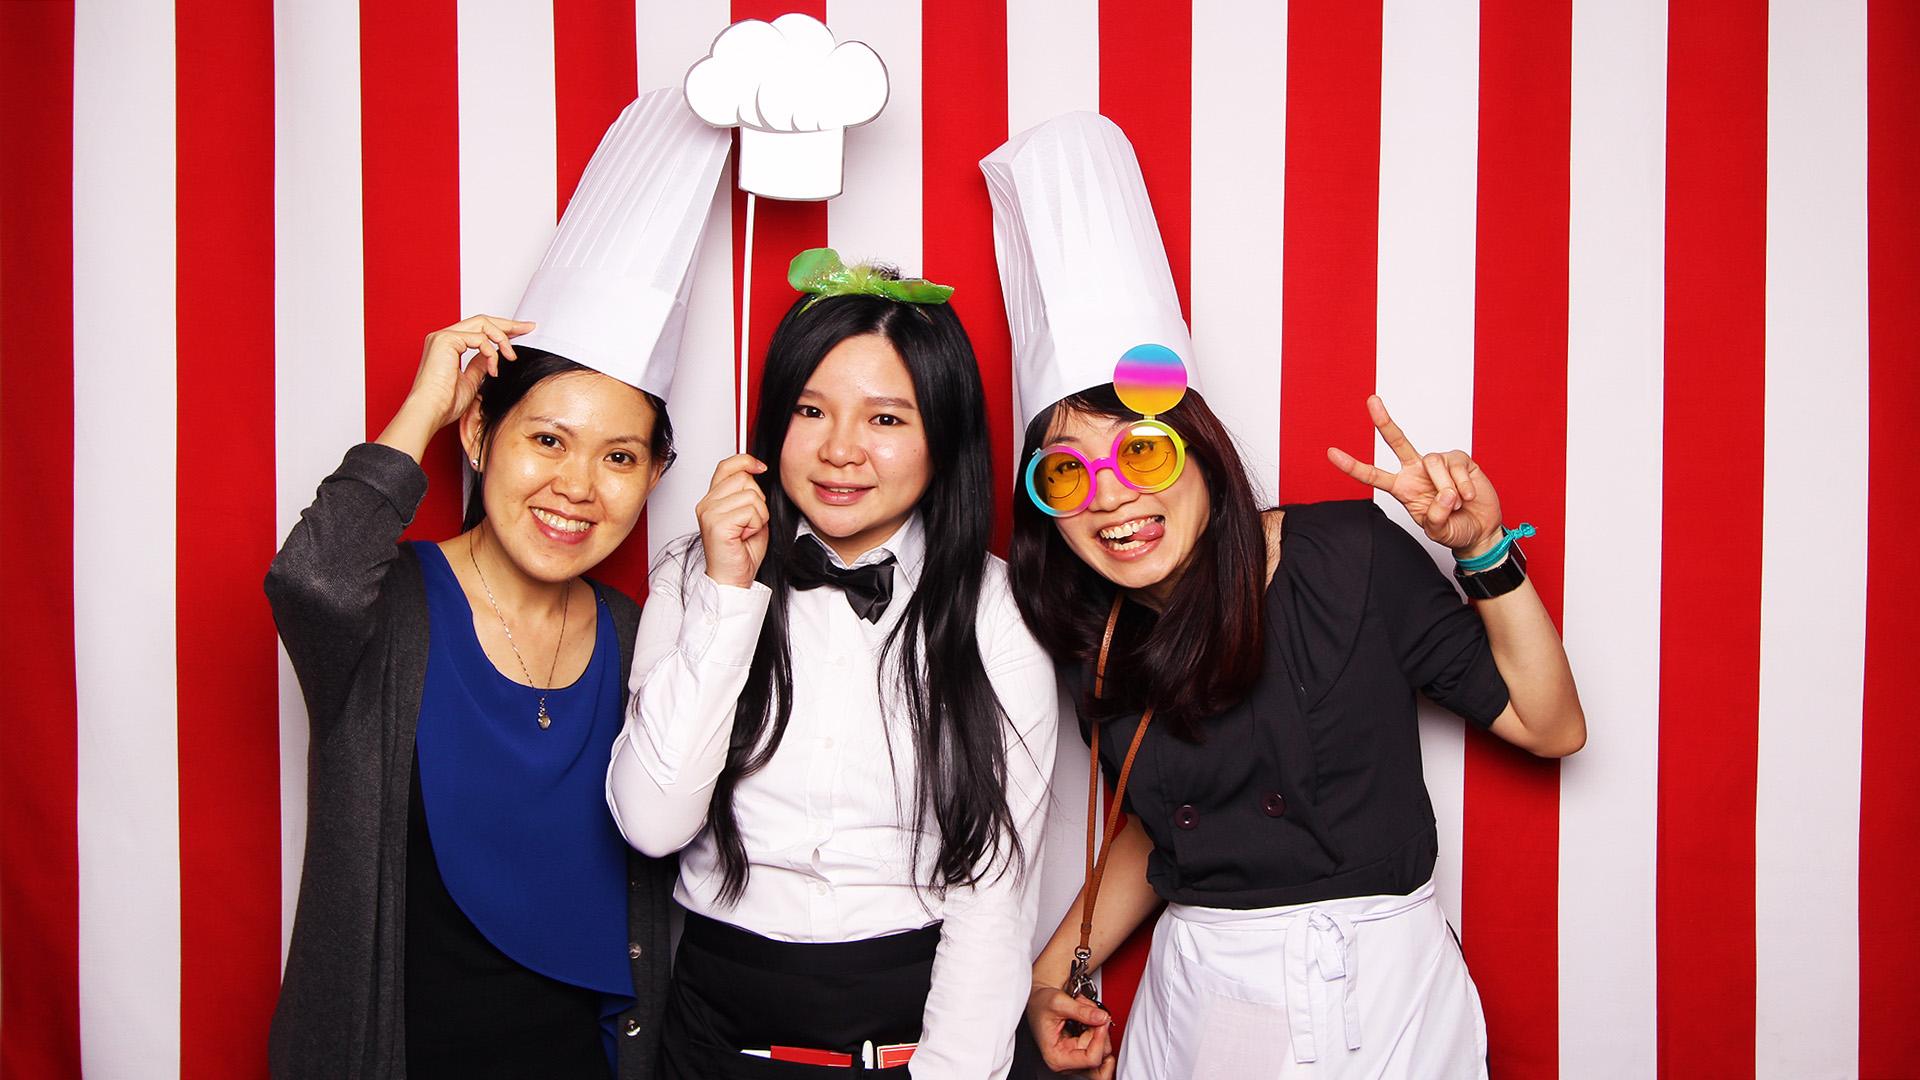 Fourstops Photography • Singapore Photobooth • OCBC MasterChef 2015 Corporate Photobooth Cover